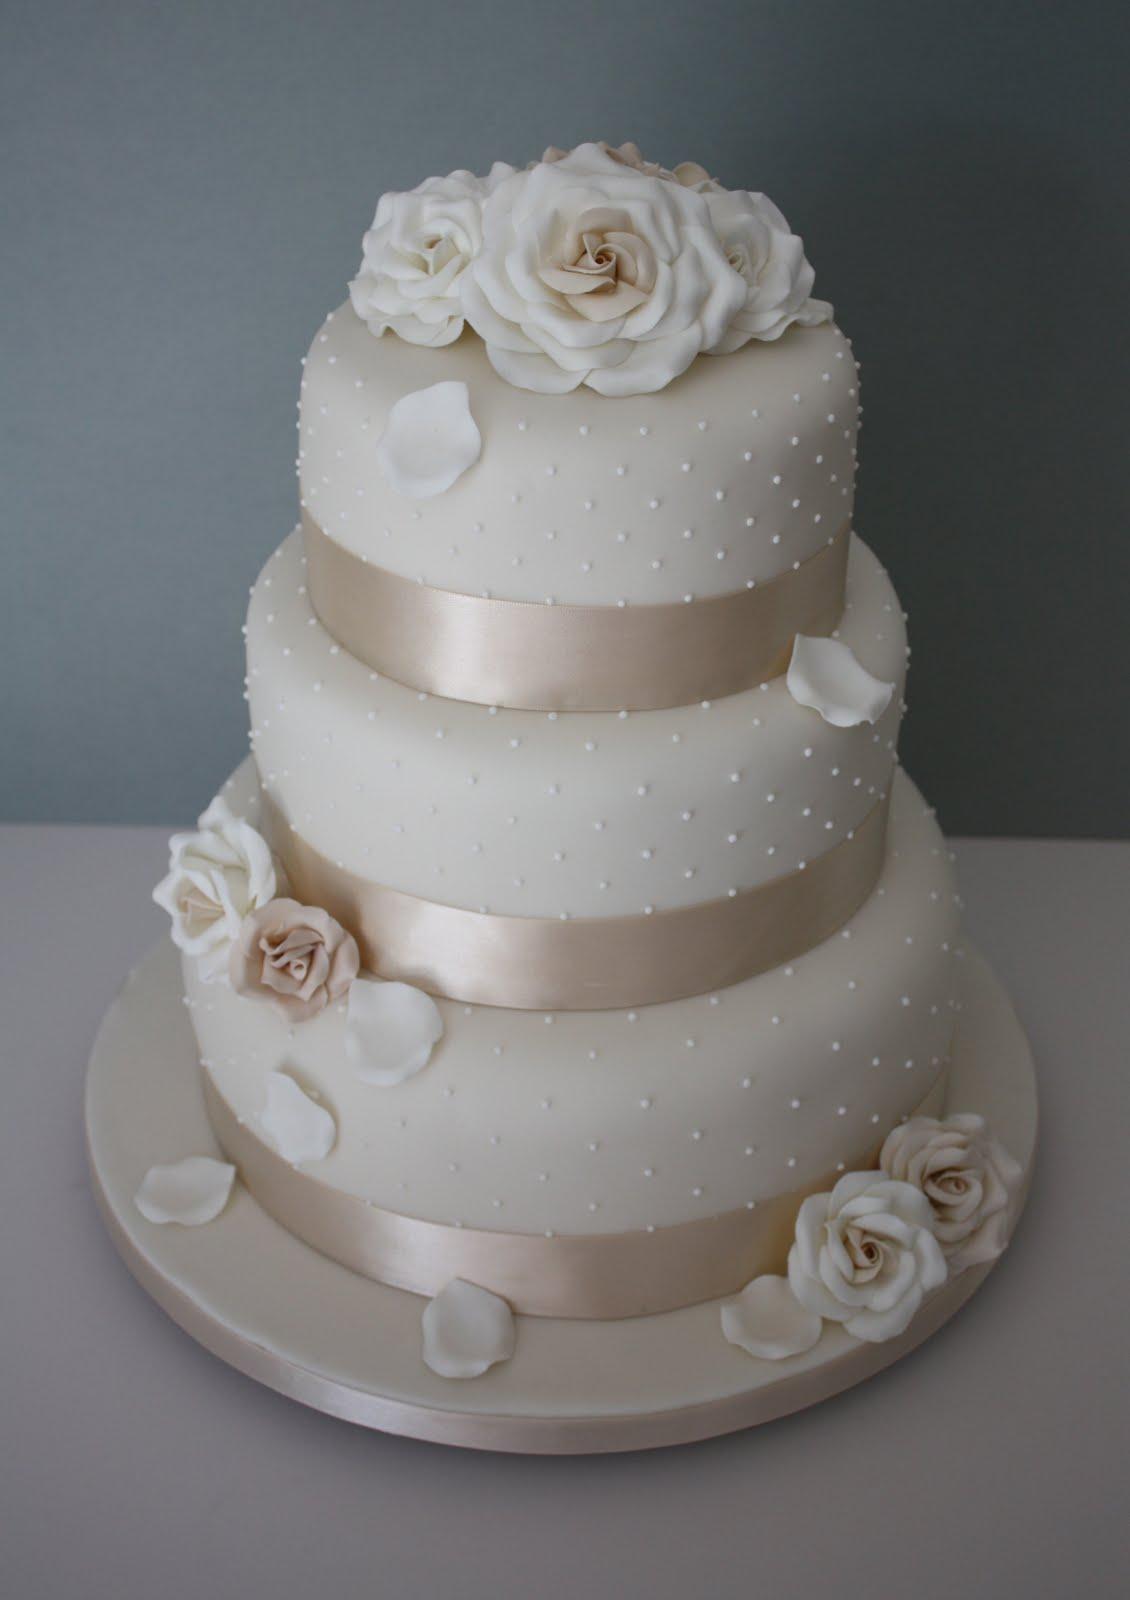 Tier Walmart Wedding Cake Ideas And Designs